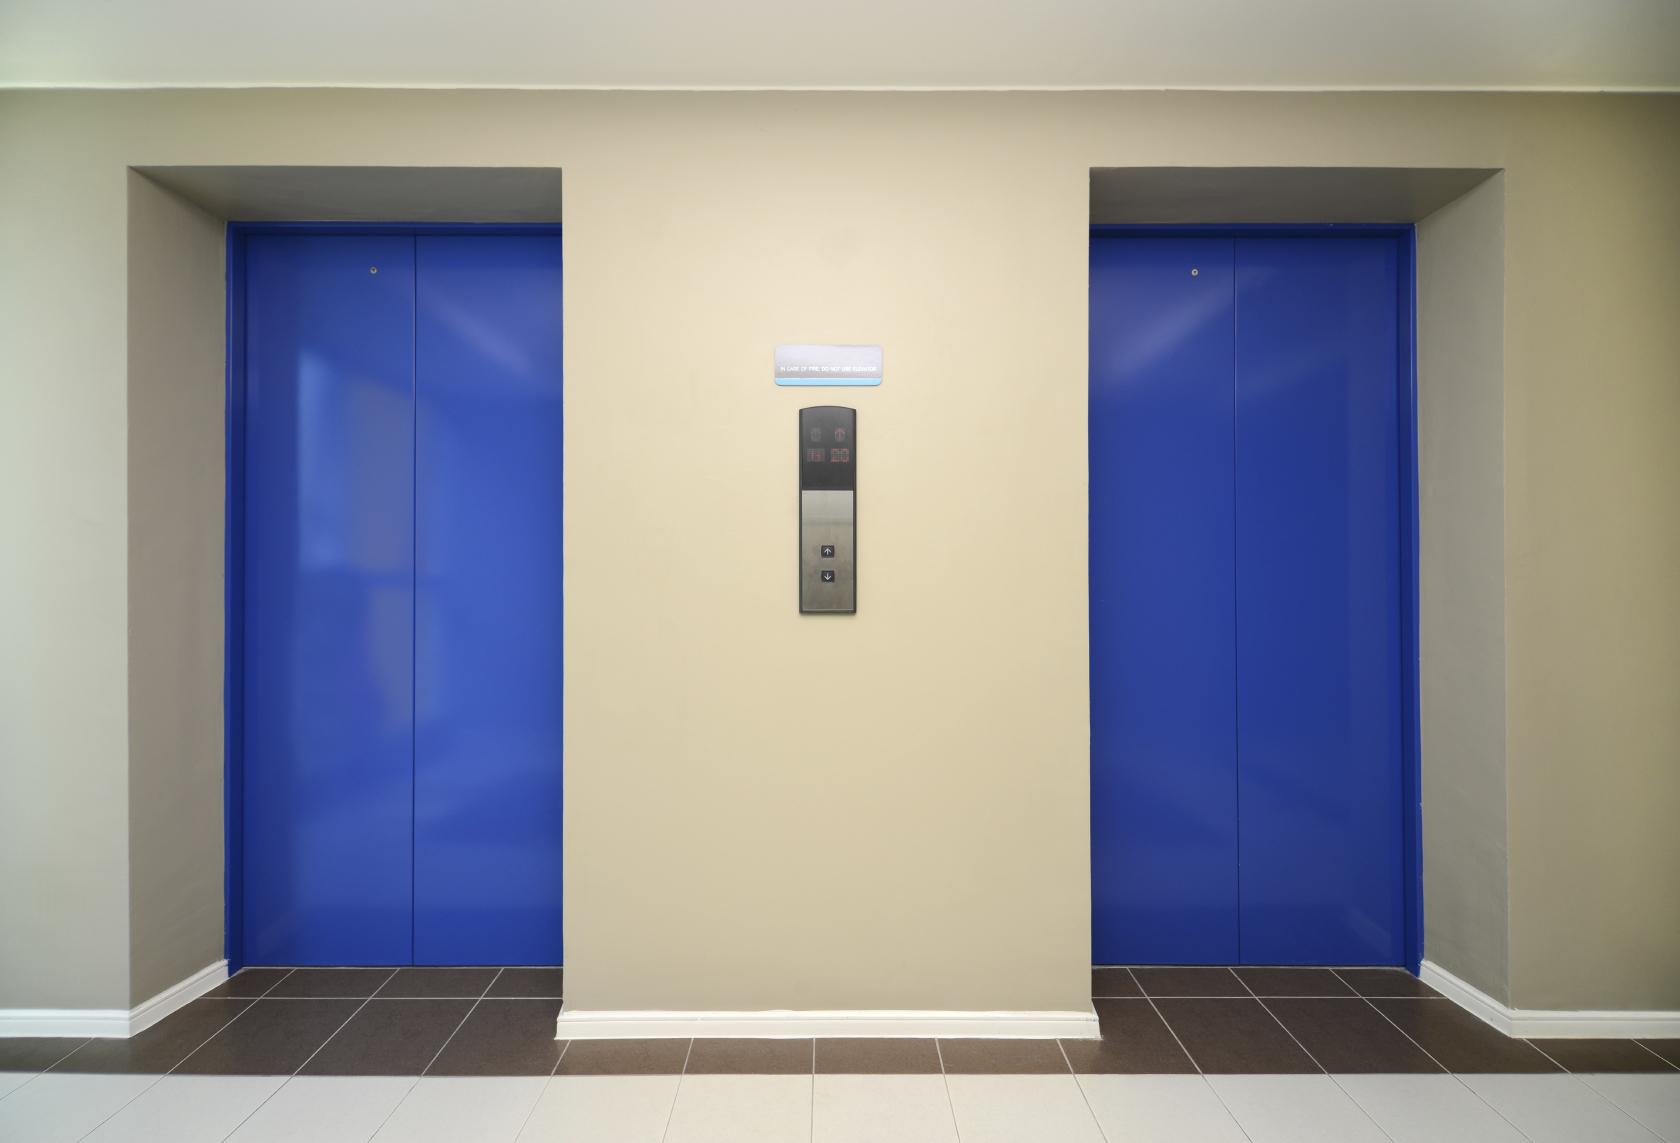 синий лифт картинки везде дома